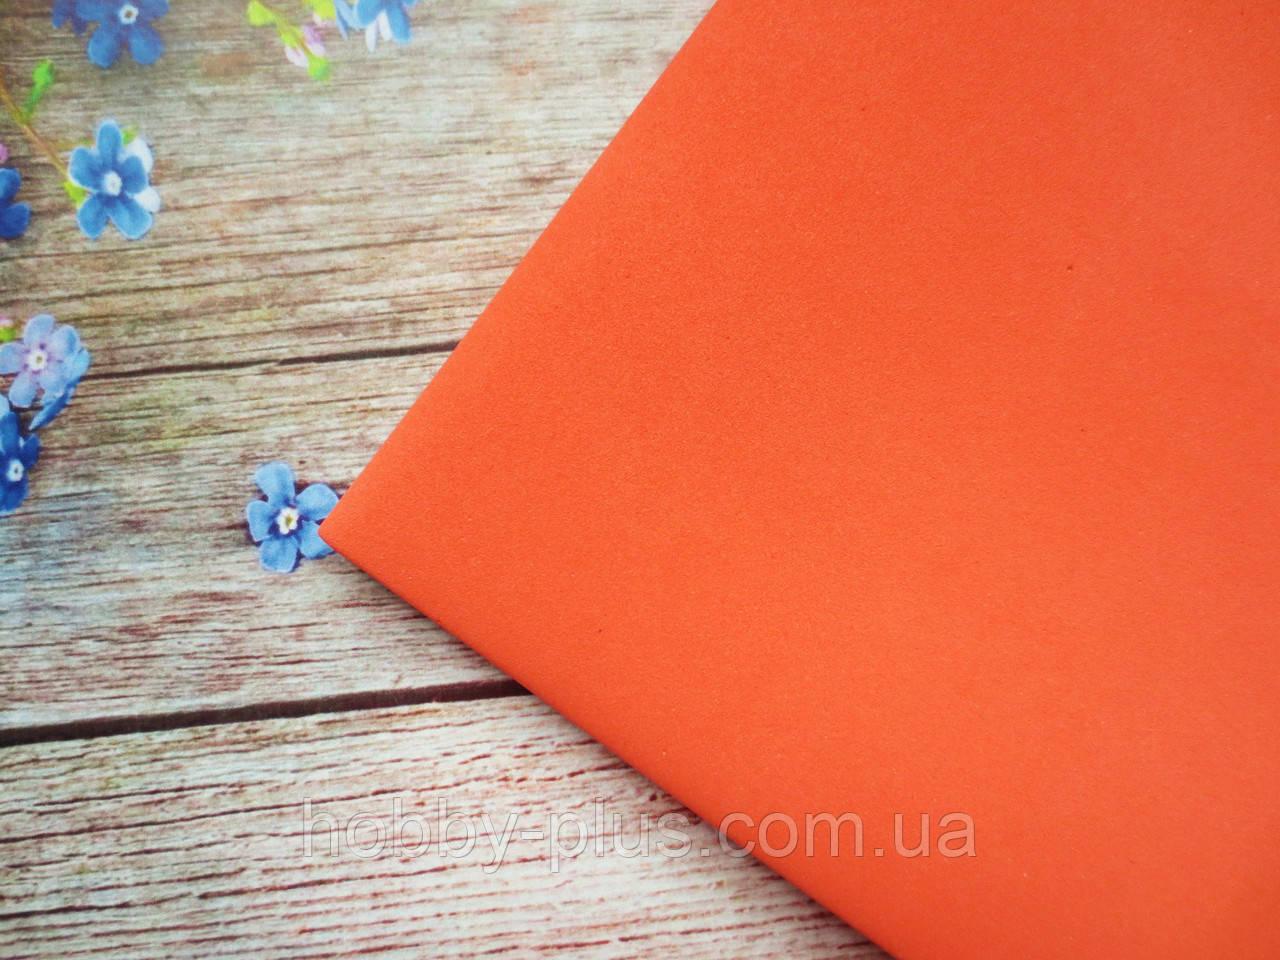 Фоамиран 1 мм, 50х50 см, цвет томатный